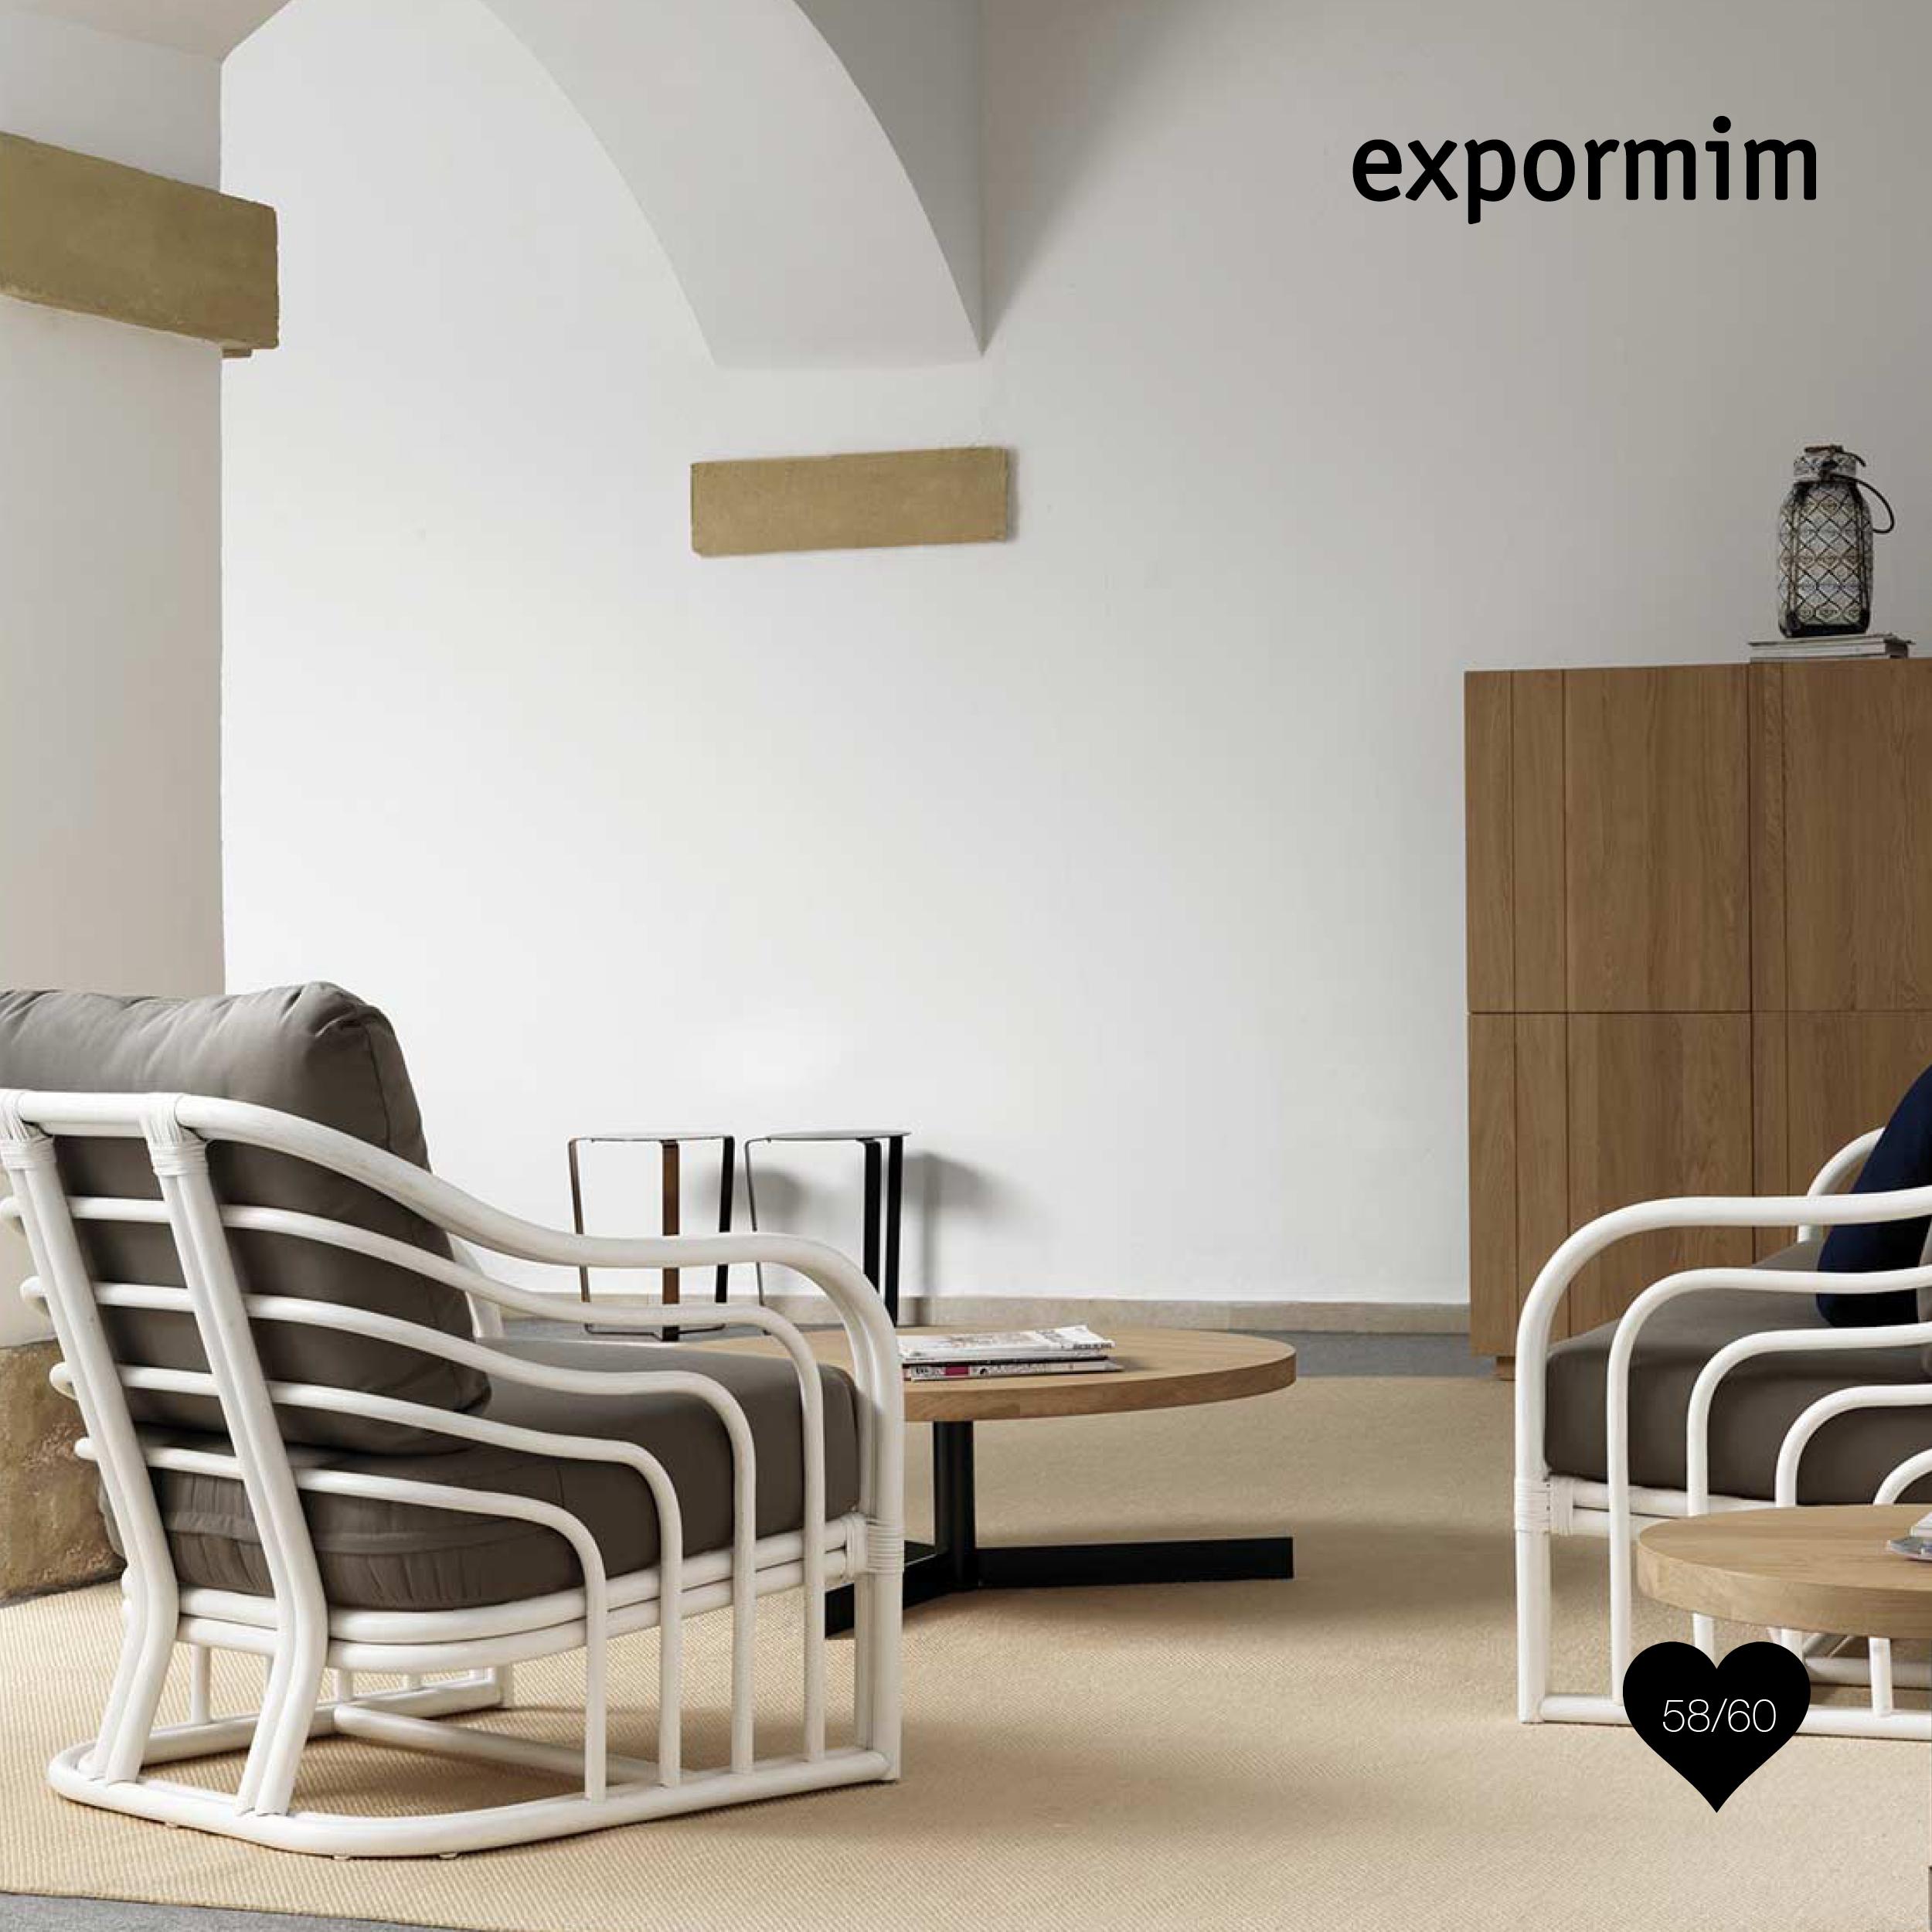 58_KE-ZU_EXPORMIM_CASA GRAN_STUDIO EXPORMIM